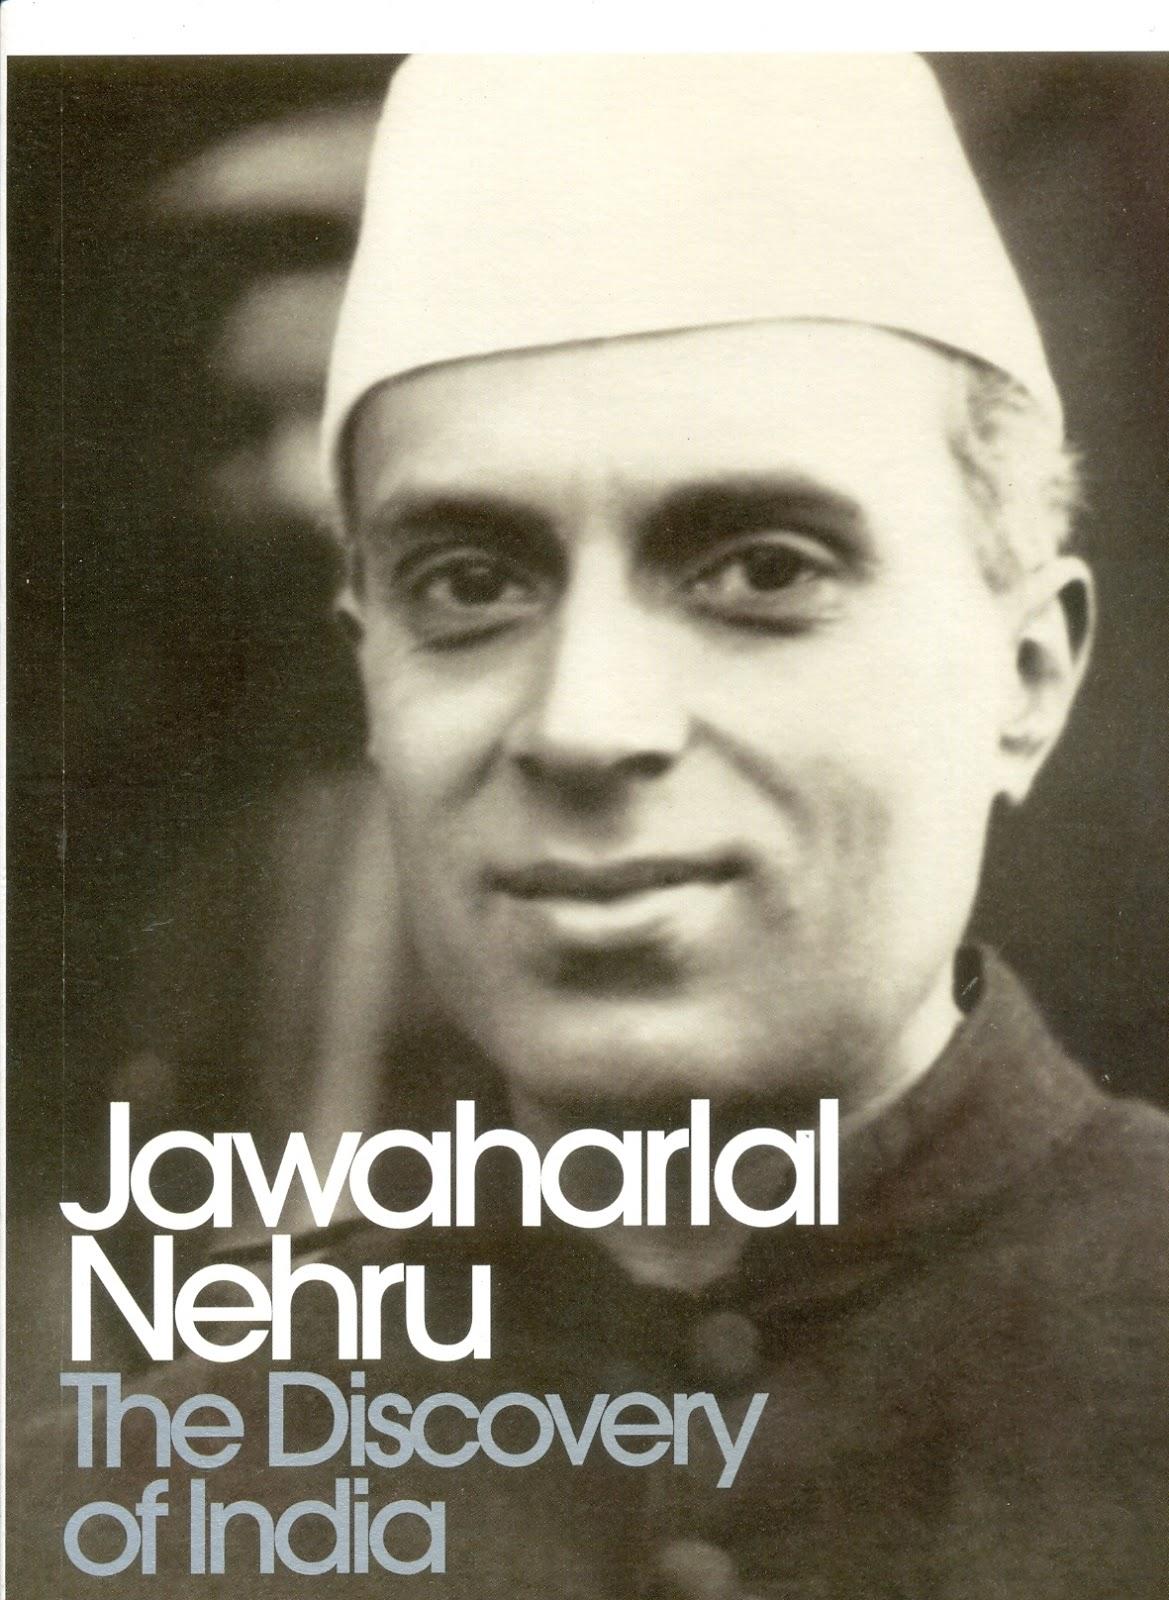 rajesh reviews day 11 jawaharlal nehru the discovery of day 11 jawaharlal nehru the discovery of continued